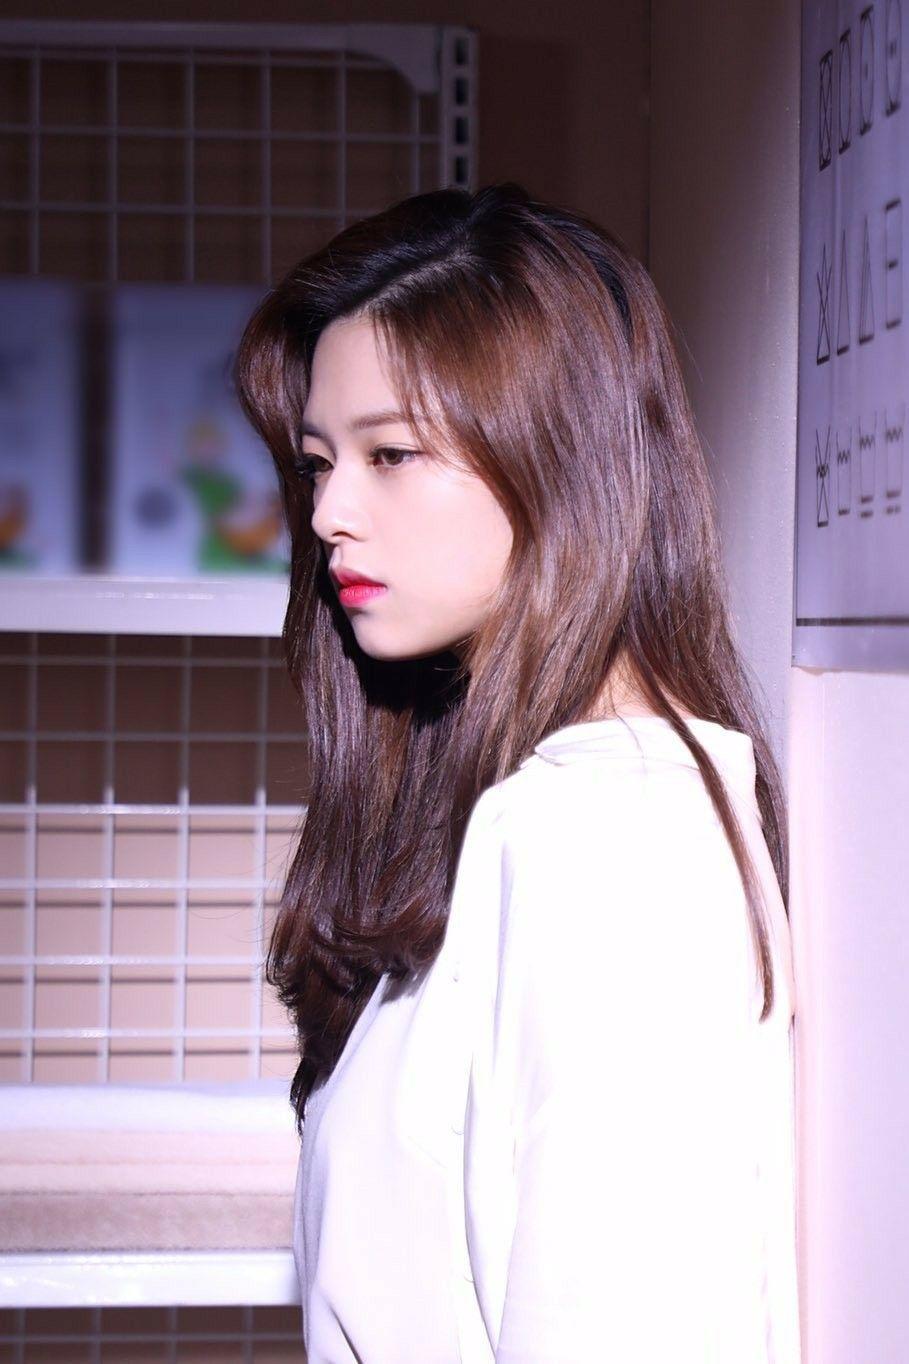 jeongyeon shoot 13